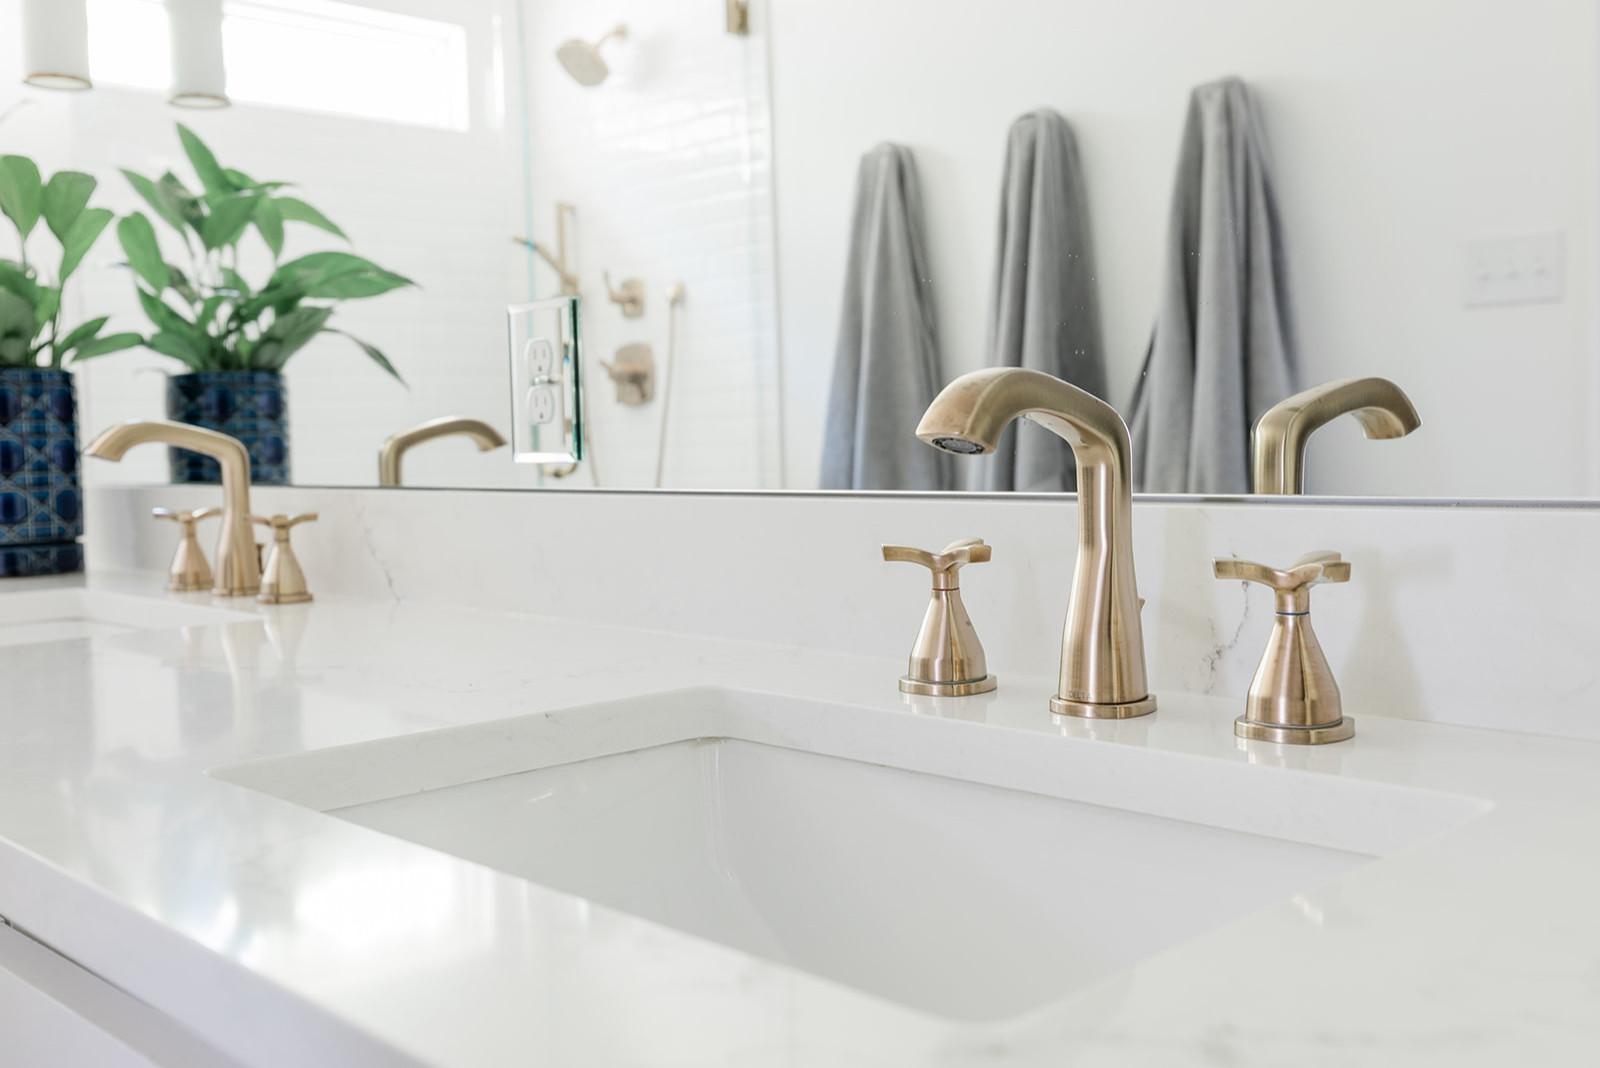 Kessler Park Remodel - Bathrooms